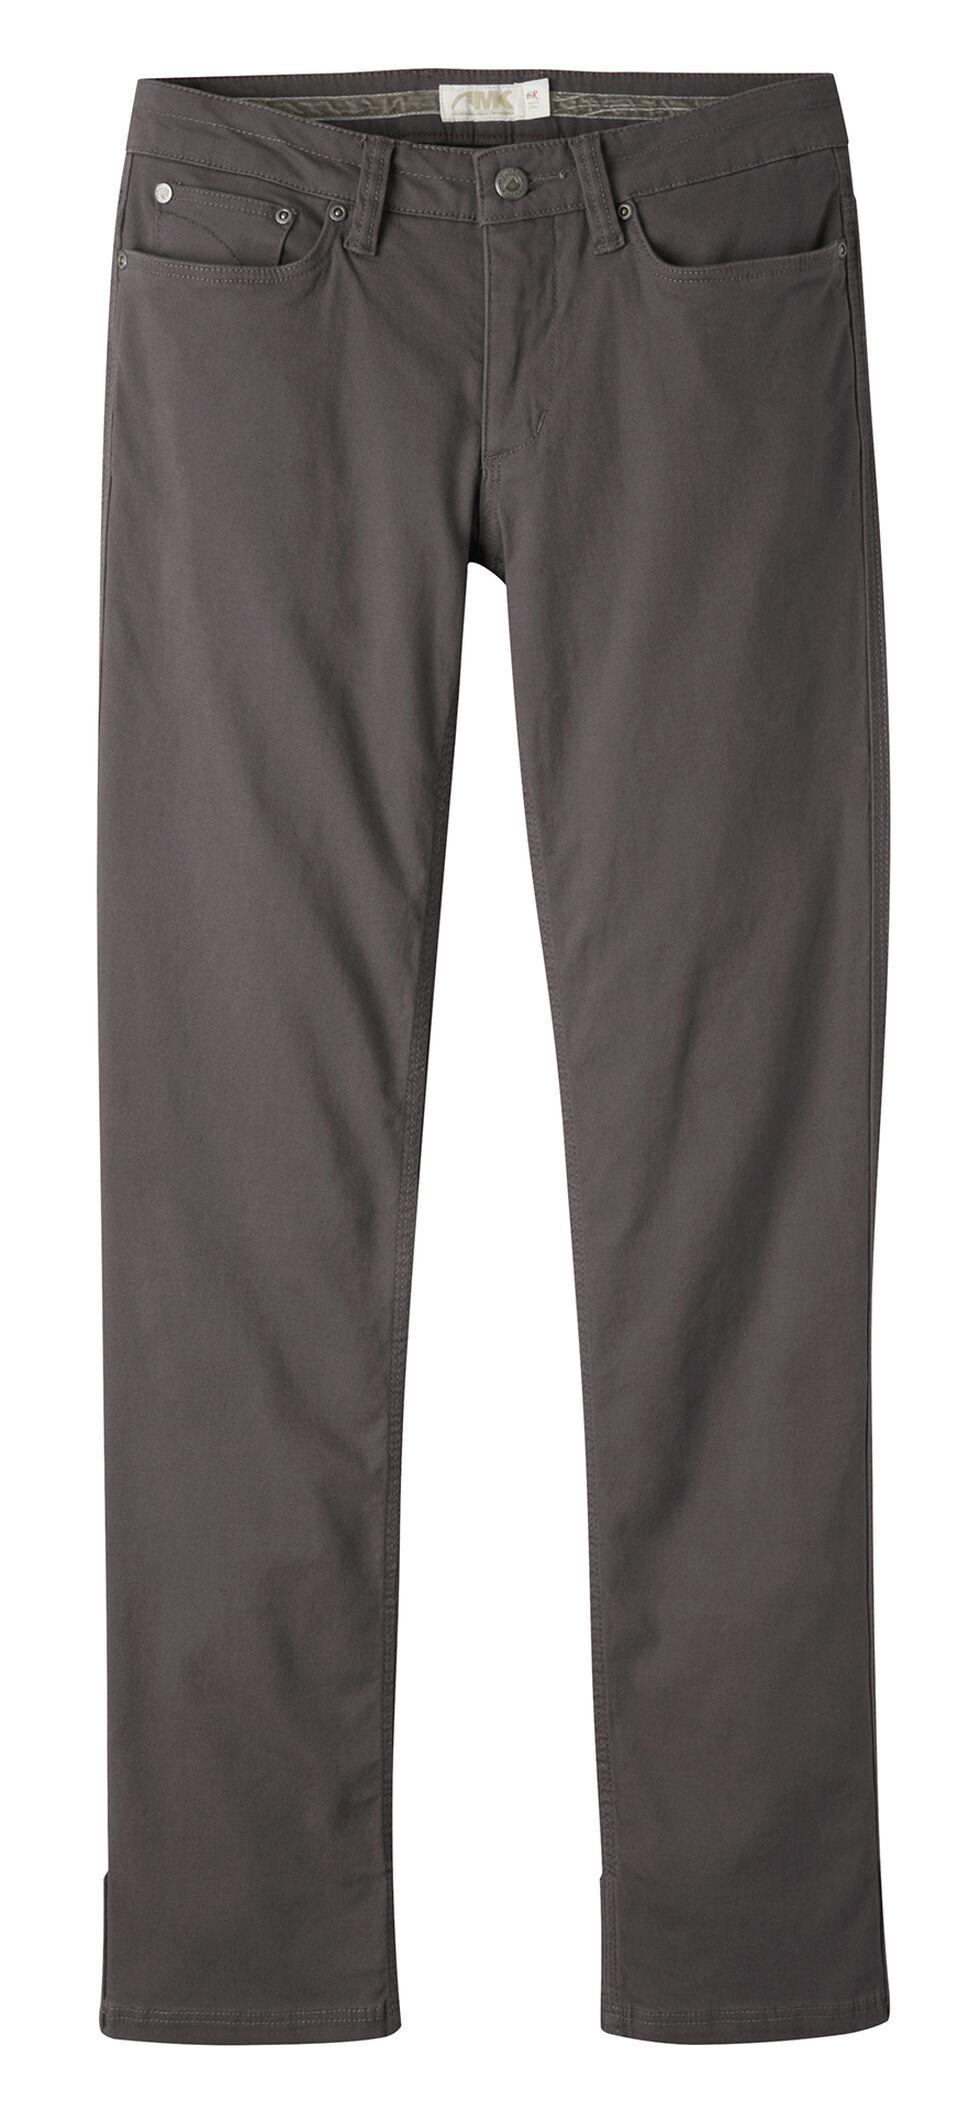 Mountain Khakis Women's Classic Fit Camber 106 Pants - Petite, Slate, hi-res